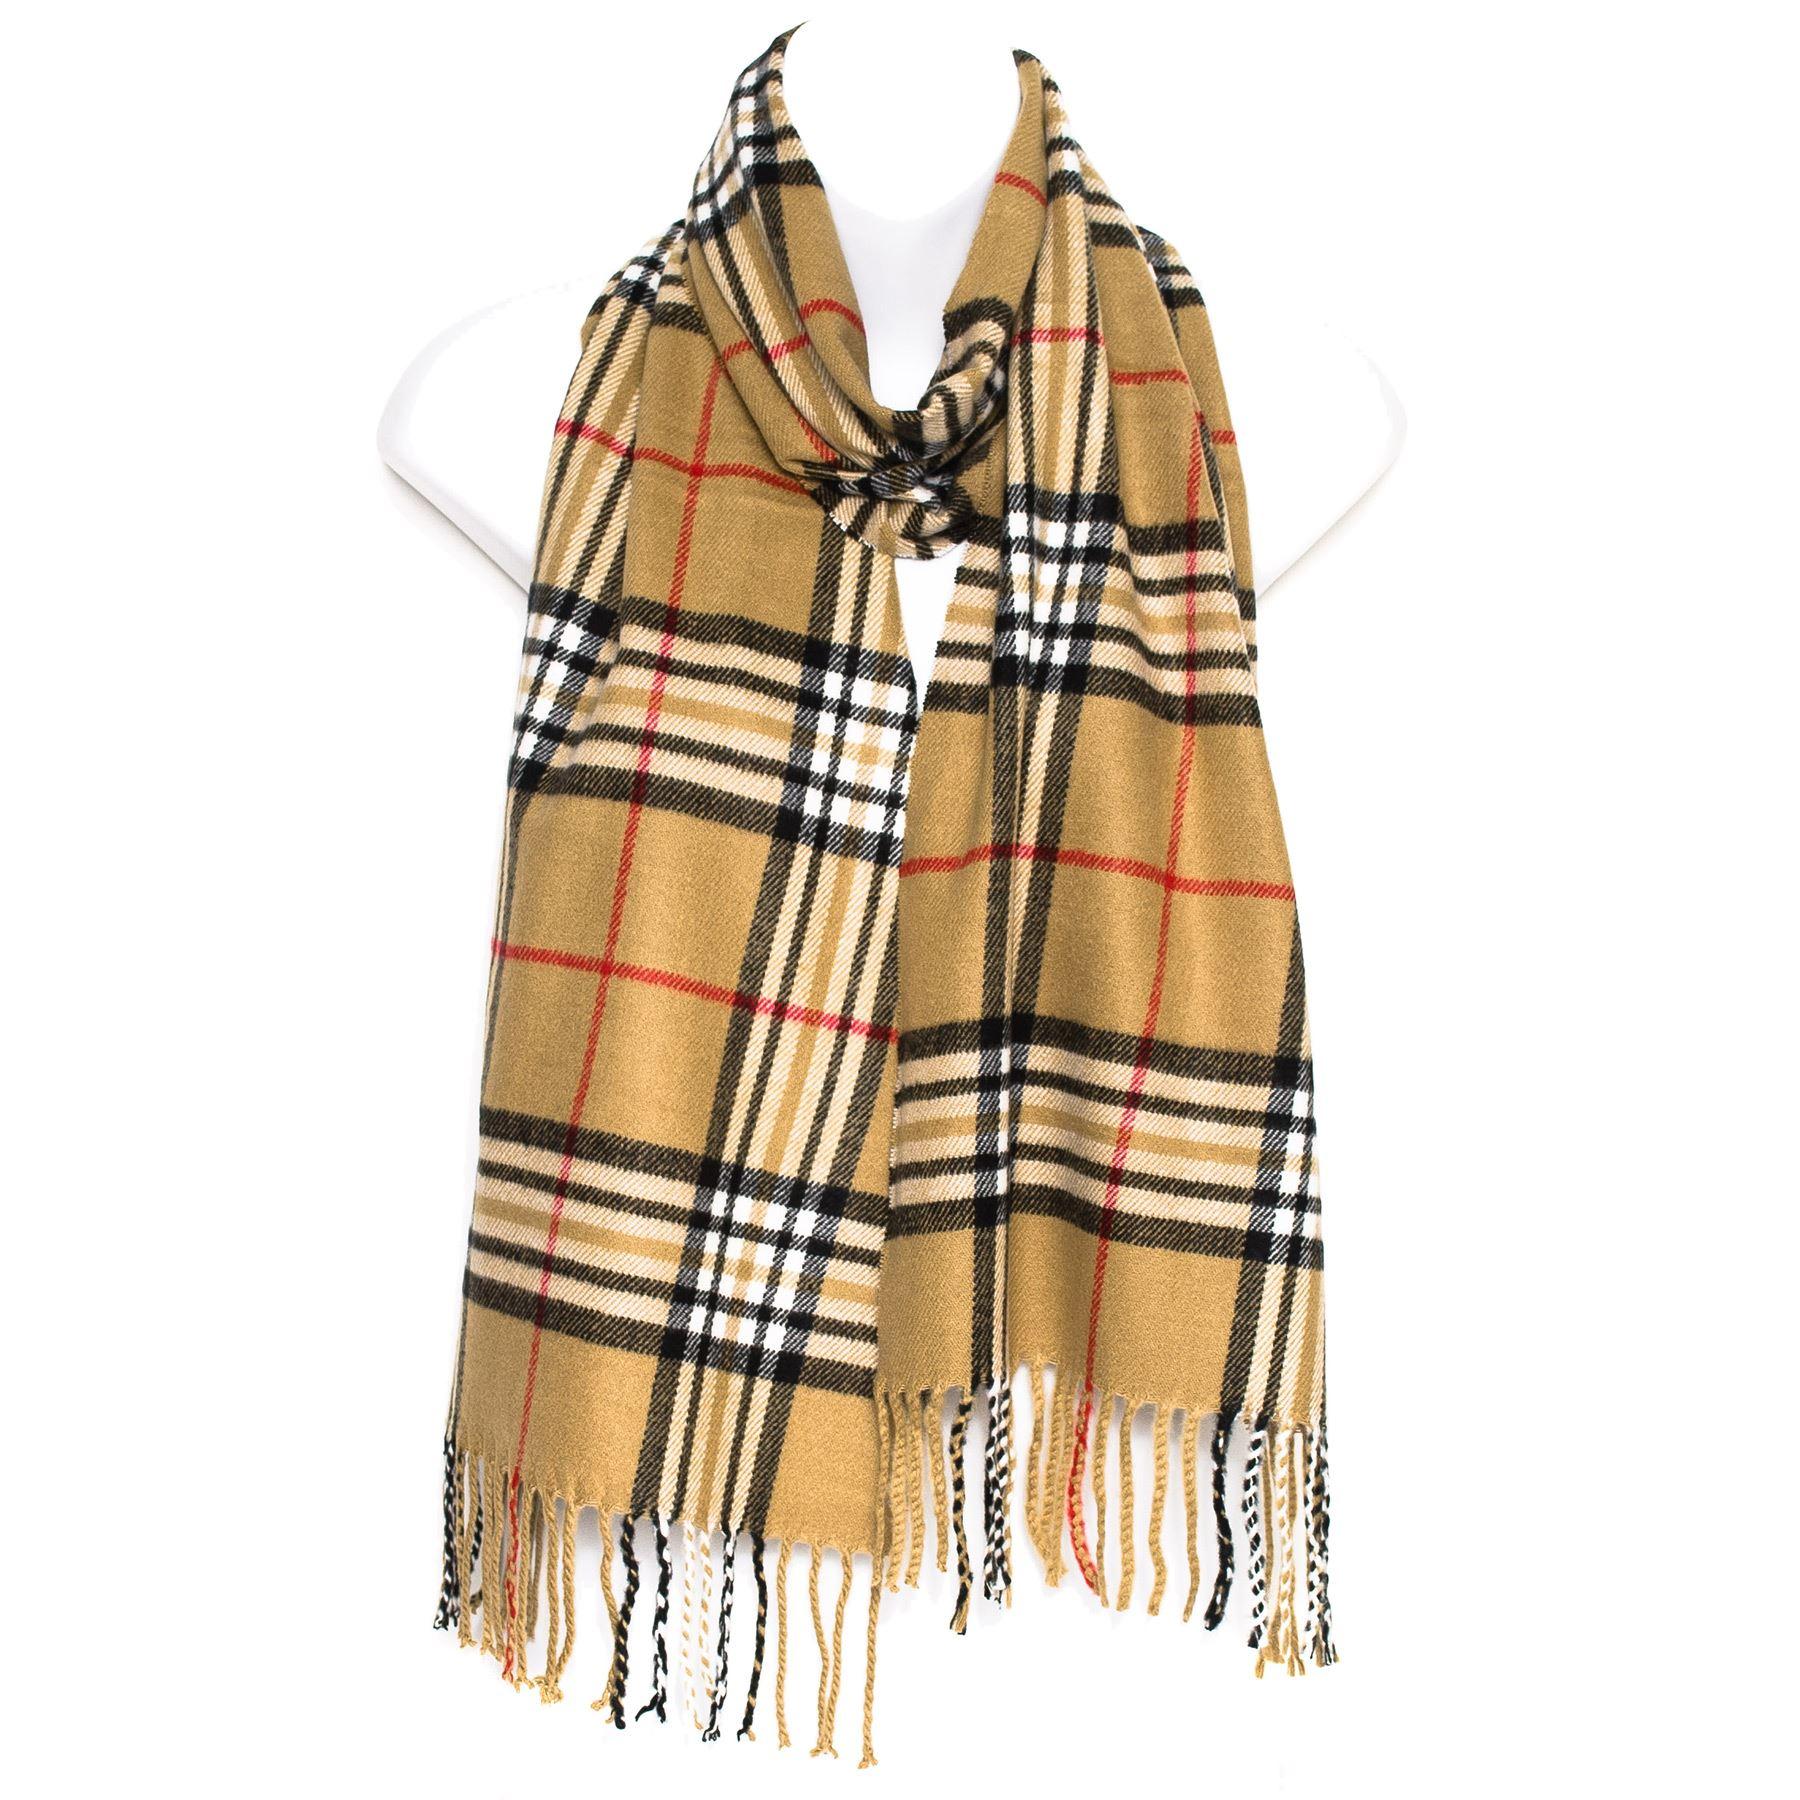 mens women lady tartan checked neck shawl stole wrap scarf ladies plaid scarves ebay. Black Bedroom Furniture Sets. Home Design Ideas